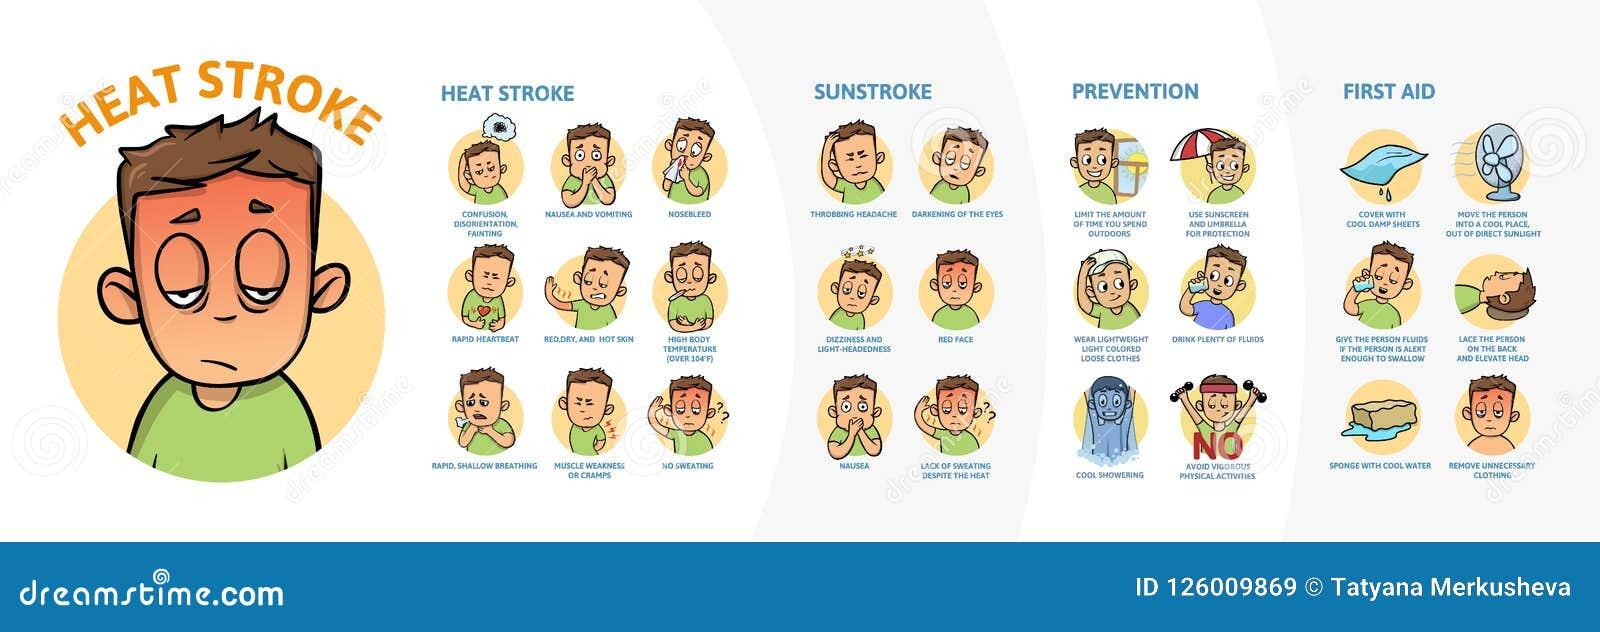 Infographics κτυπήματος θερμότητας και ηλίασης Σημάδια, συμπτώματα, και prvention Αφίσα πληροφοριών με το κείμενο και χαρακτήρας